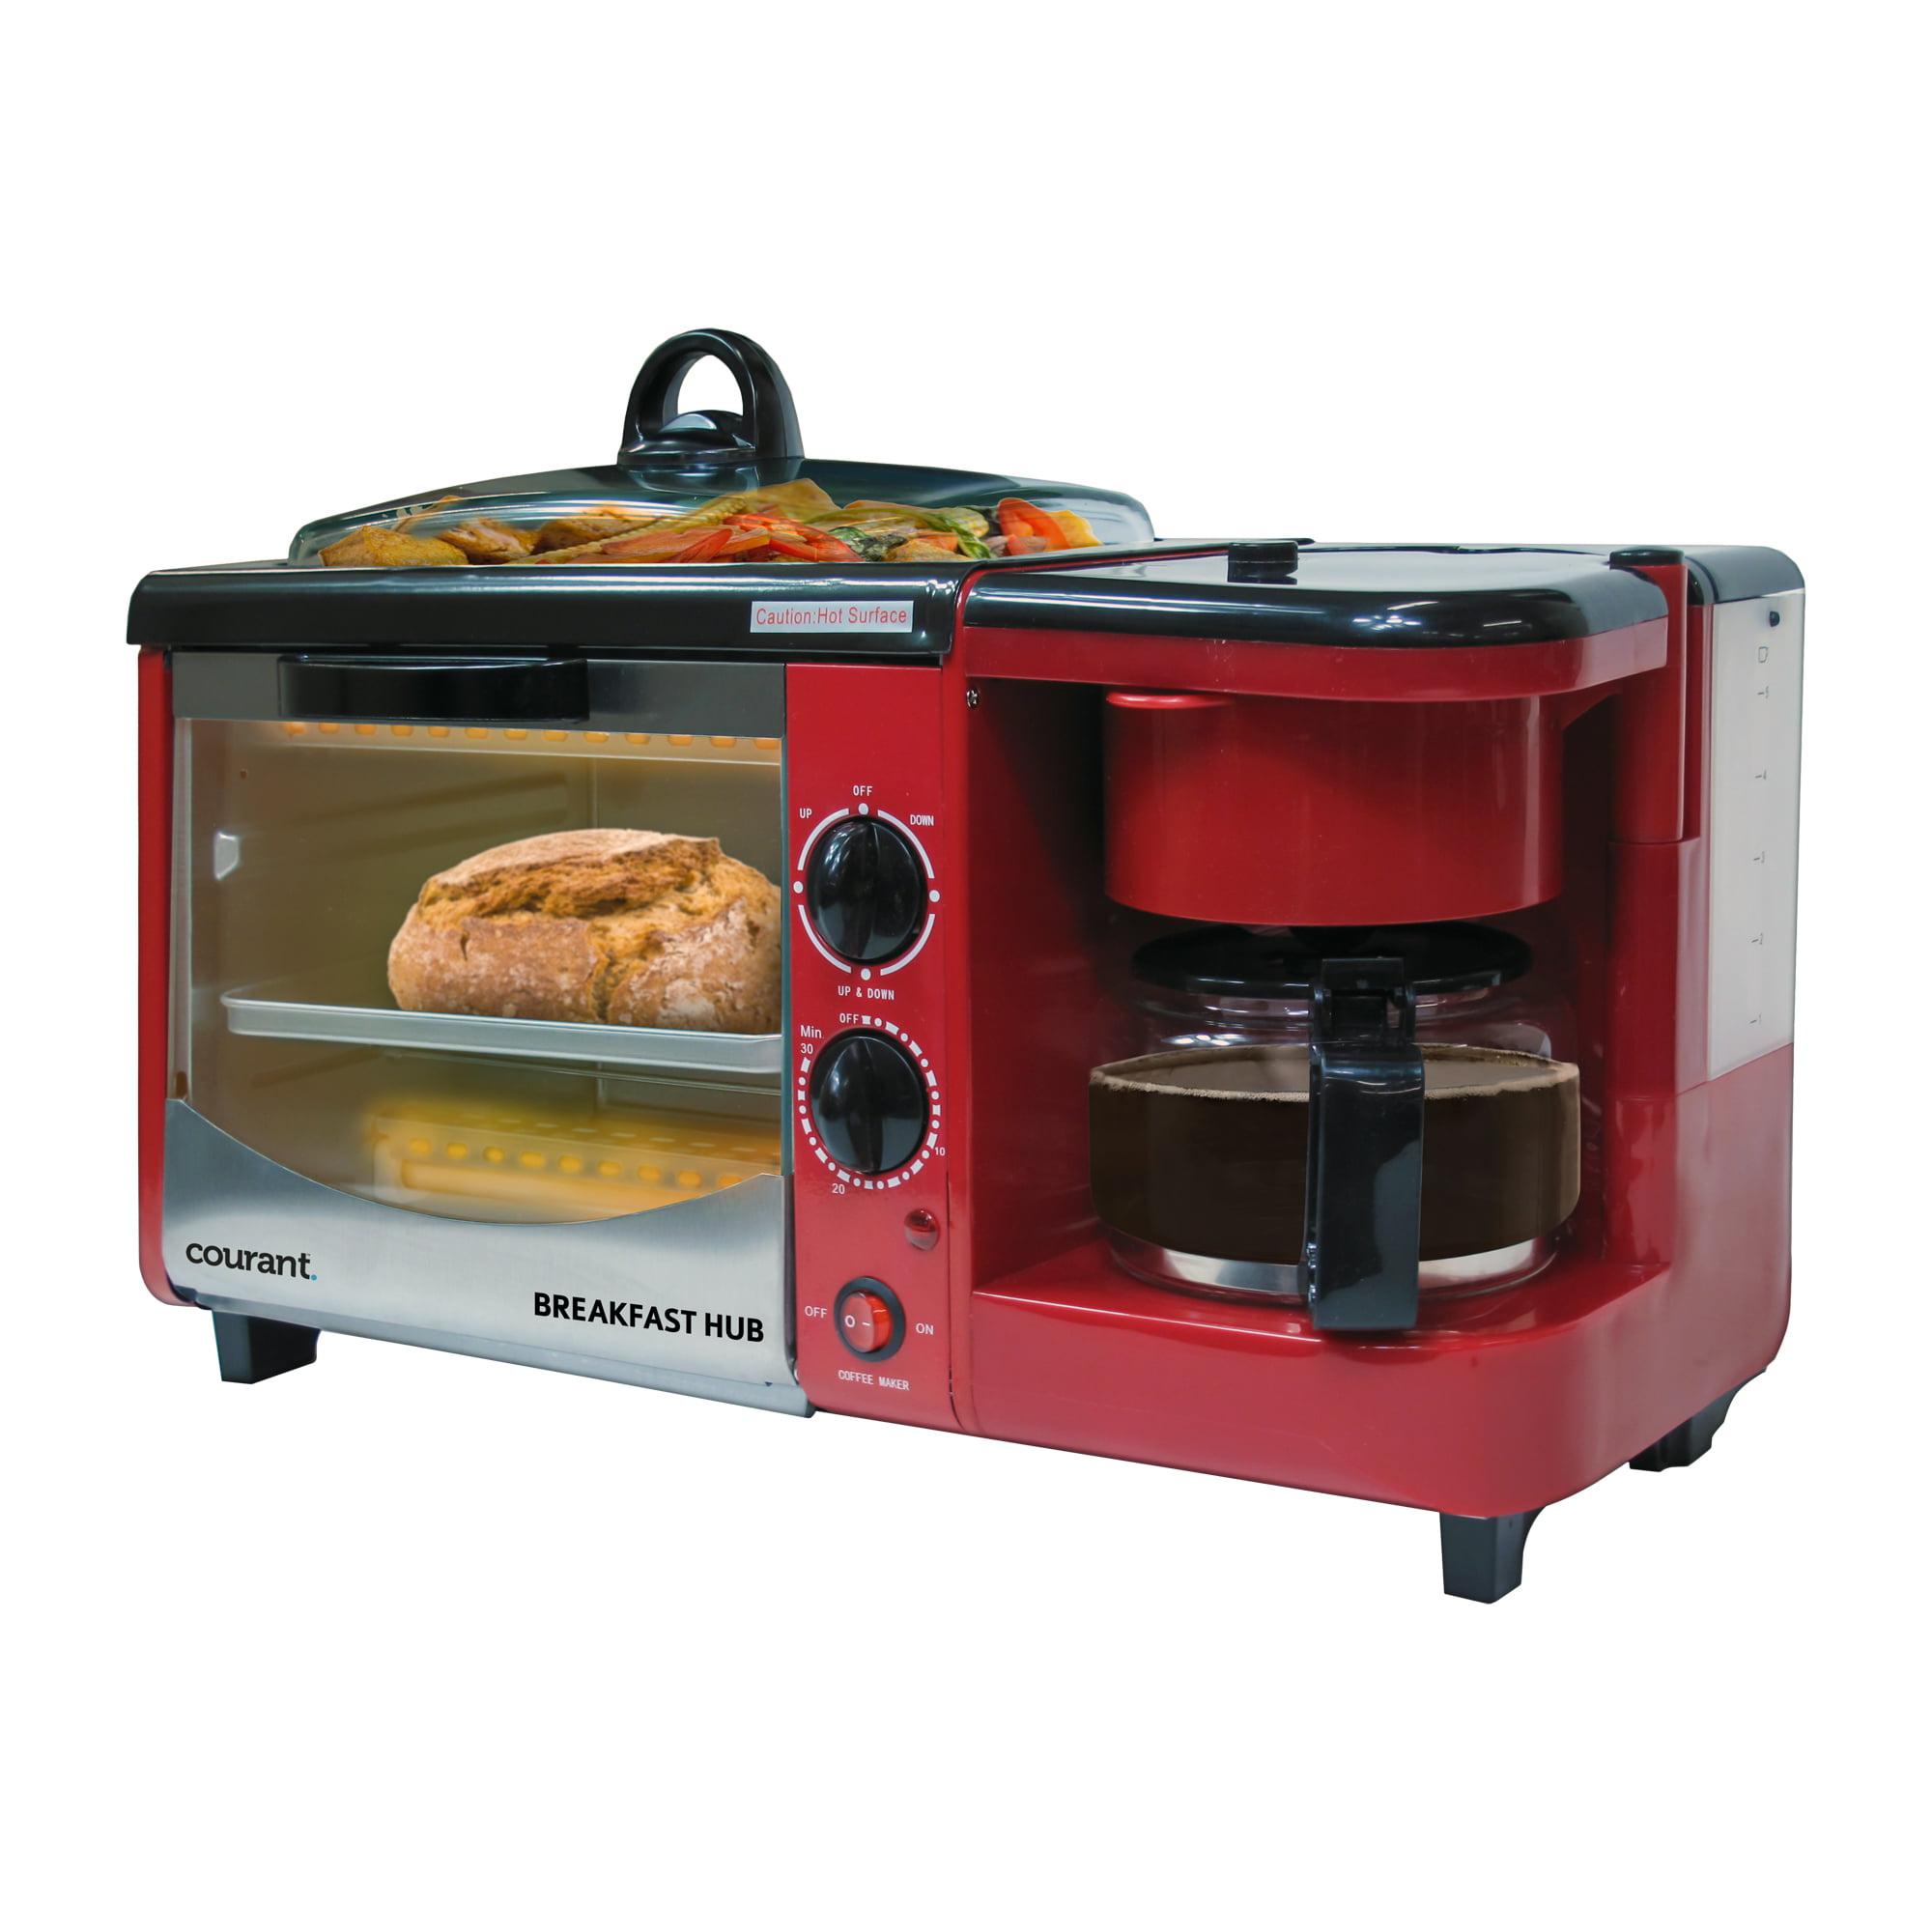 Uncategorized Multifunction Kitchen Appliances courant cbh4601 3 in 1 multifunction breakfast hub red walmart com